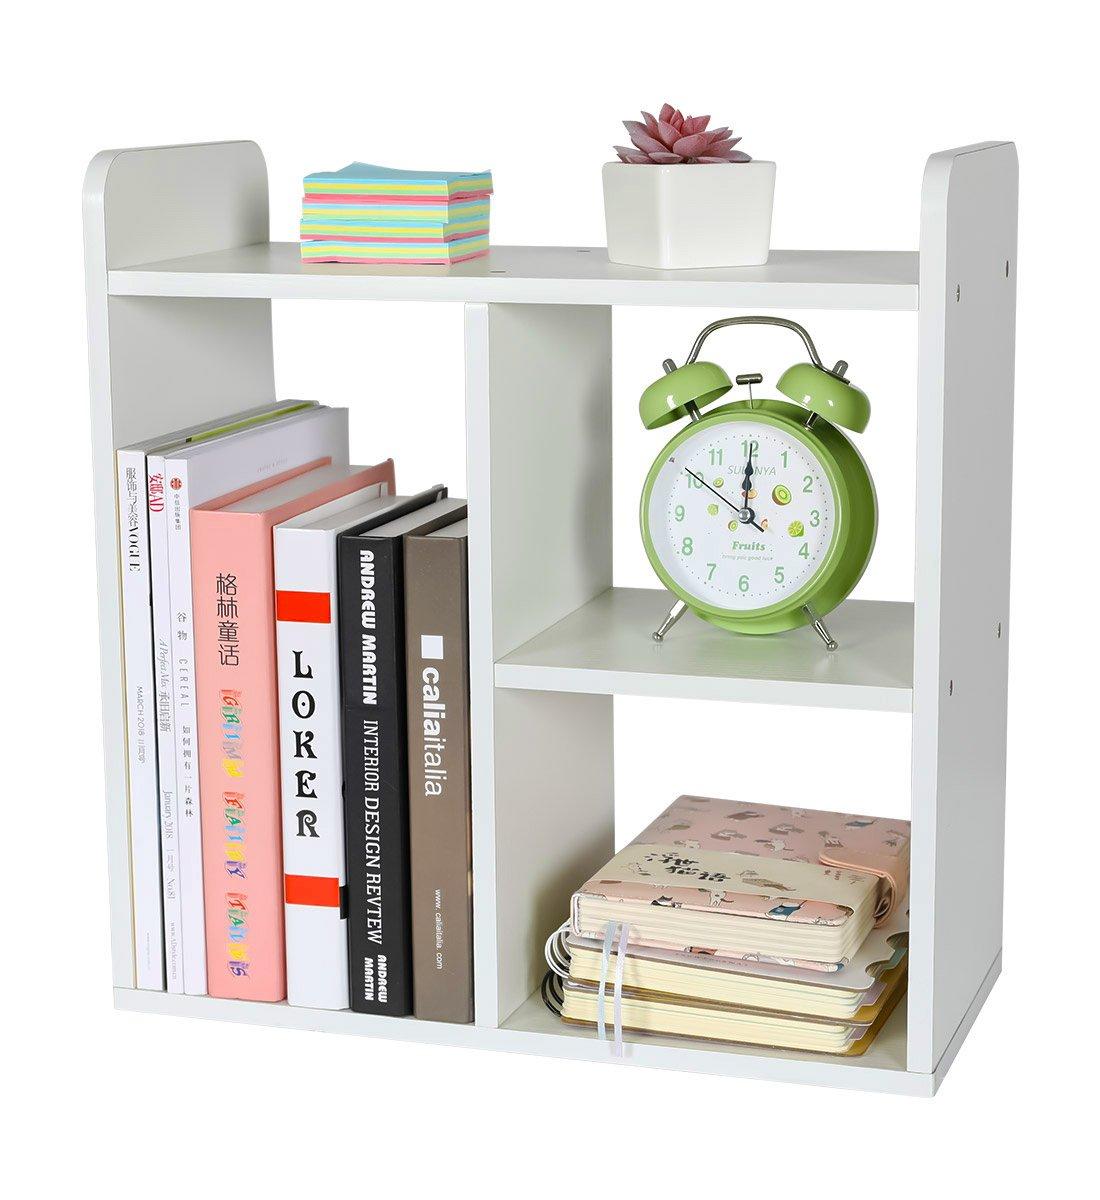 PAG Desktop Bookshelf Freestanding Countertop Bookcase Wood Desk Organizer Literature Photo Display Rack, White by PAG